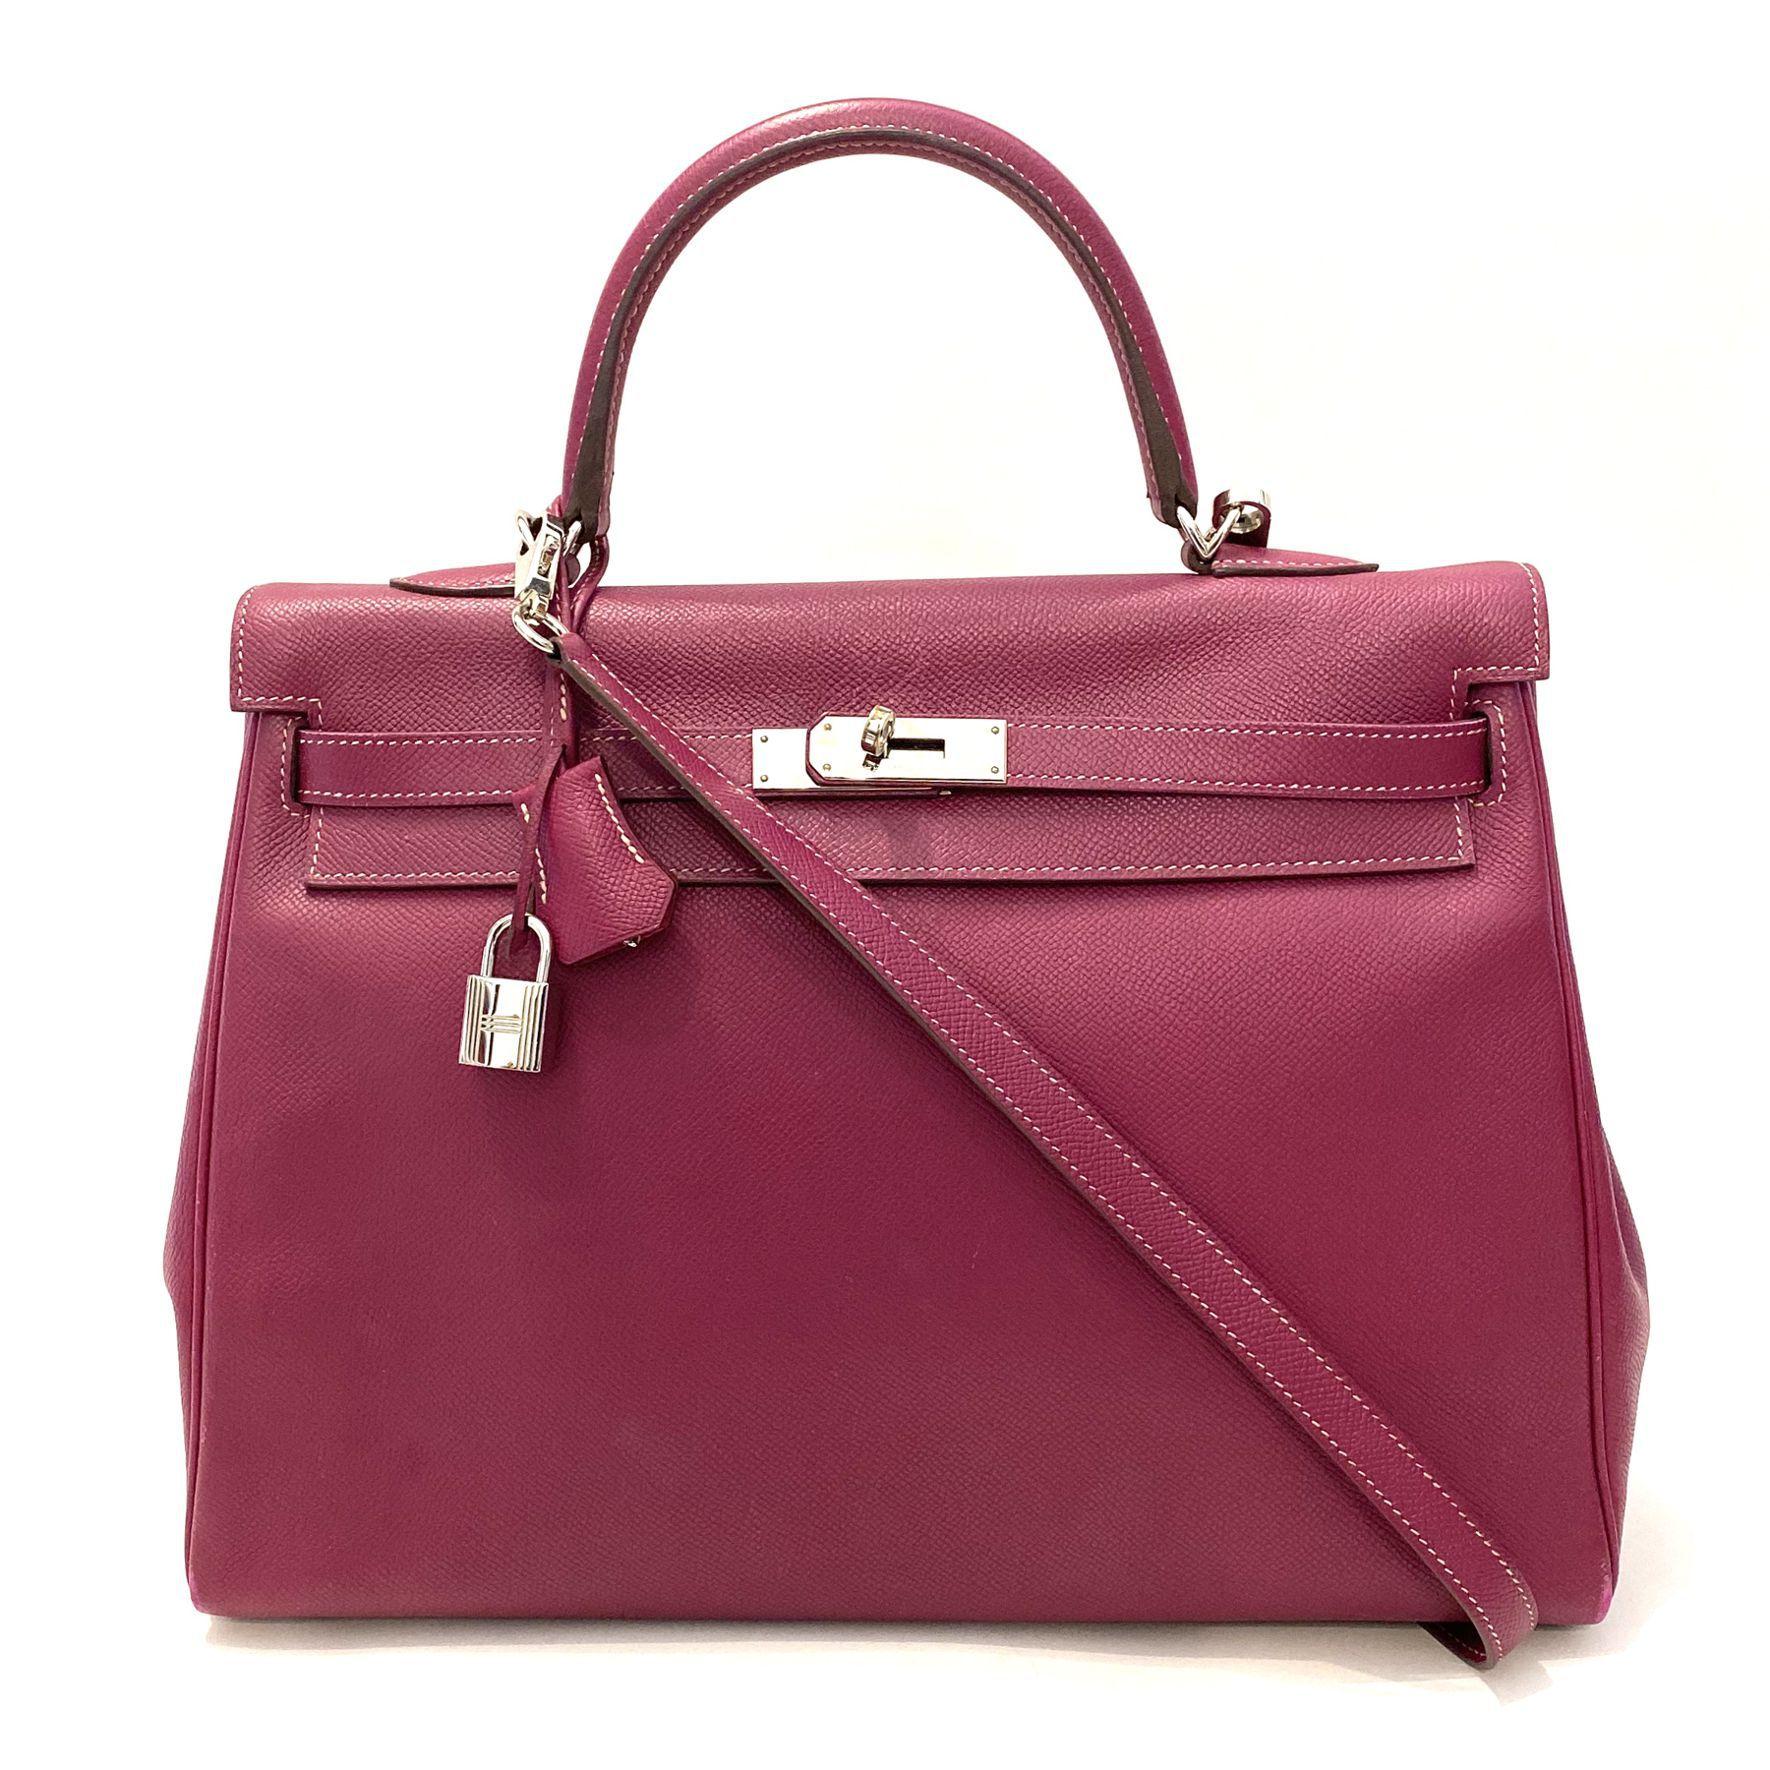 Bolsa Hermès Kelly 35 Framboesa